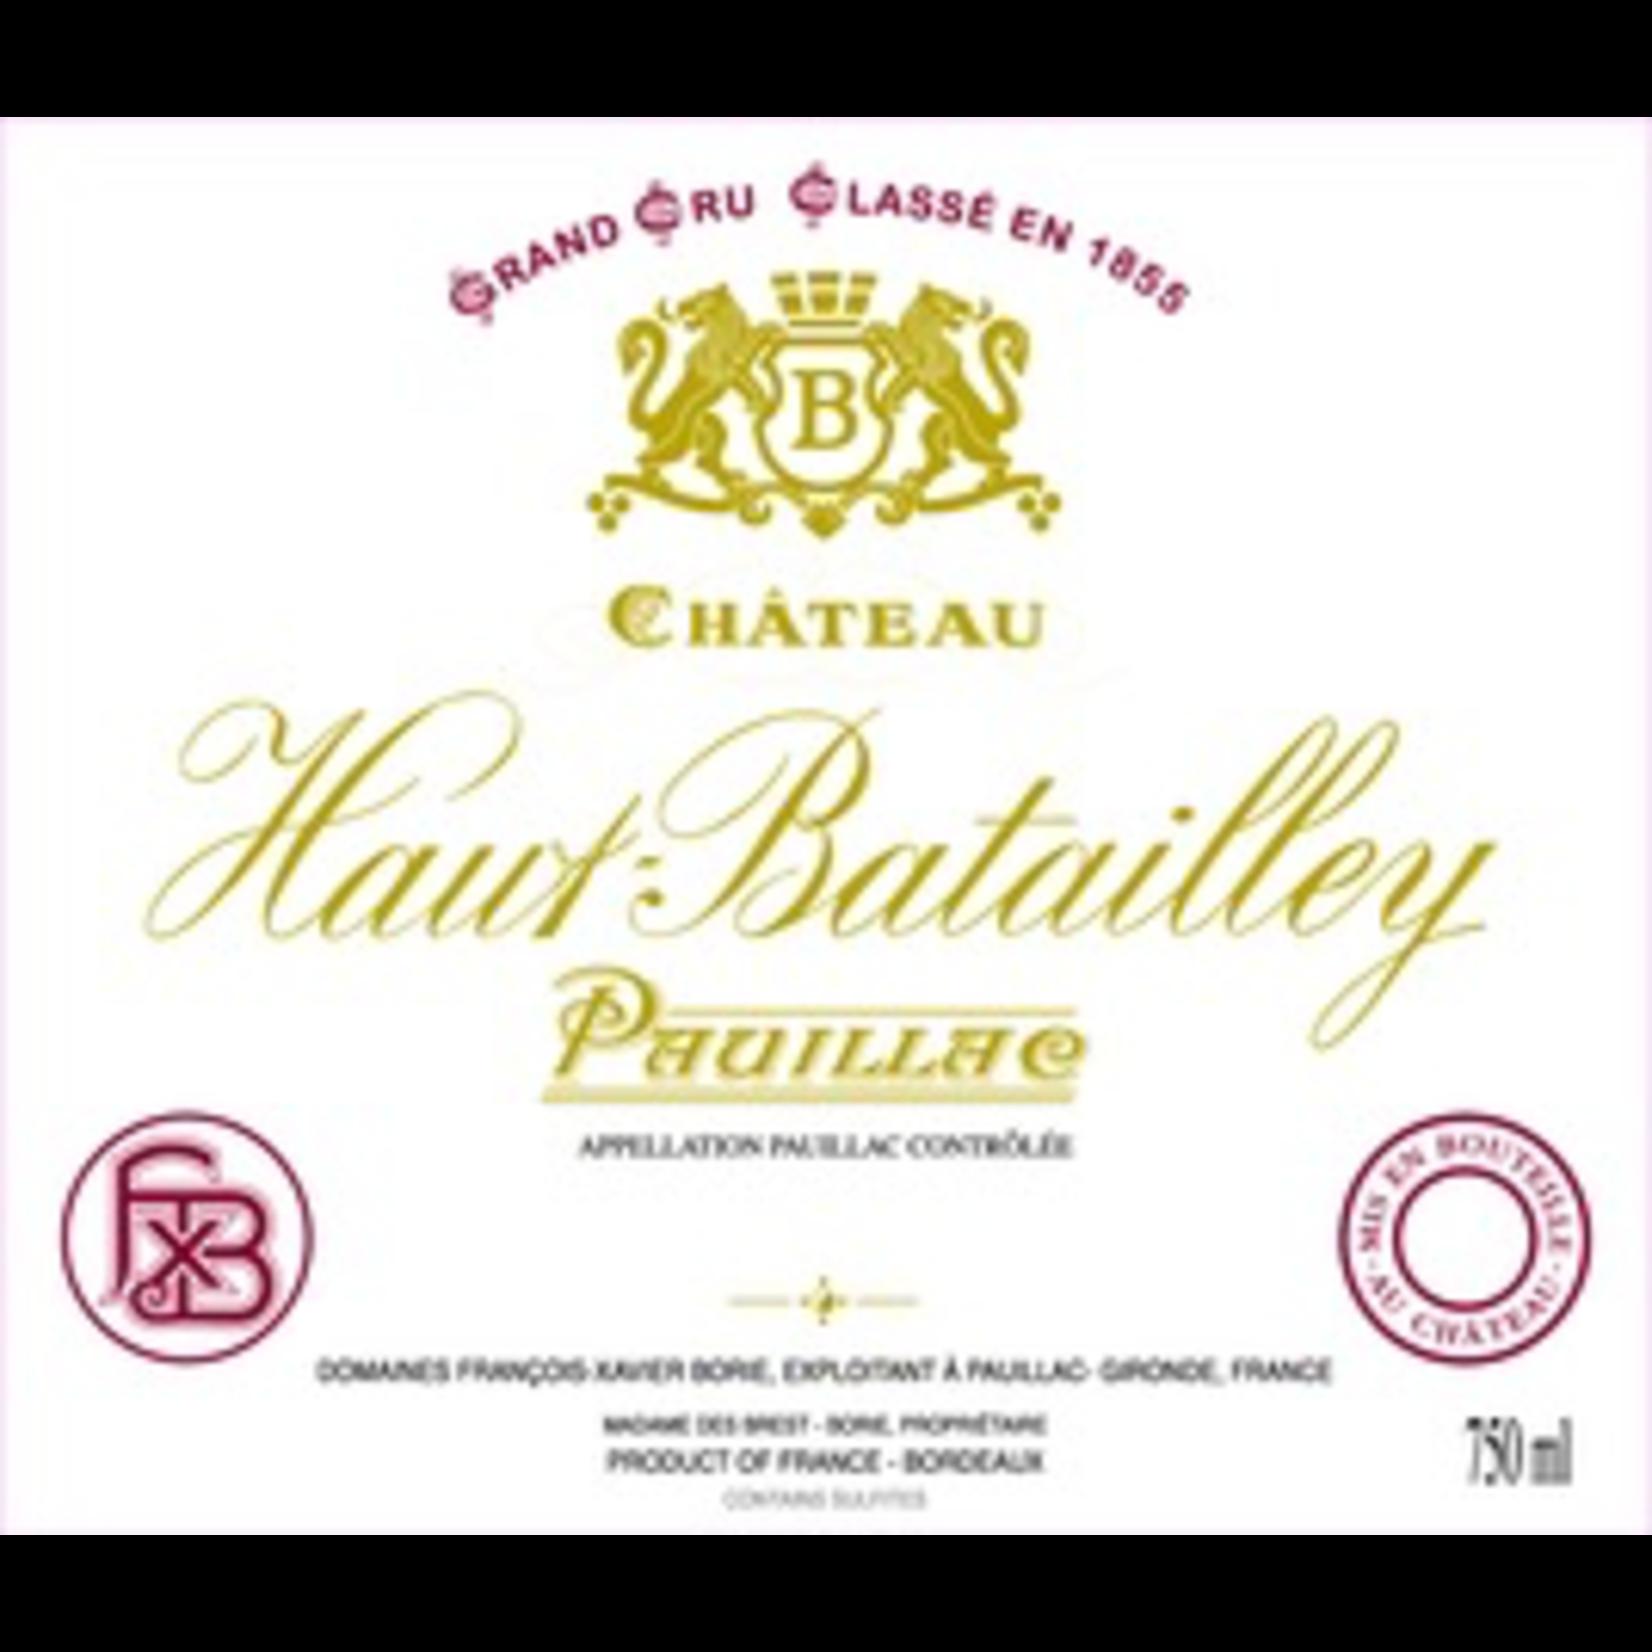 Wine Chateau Haut Batailley 2018